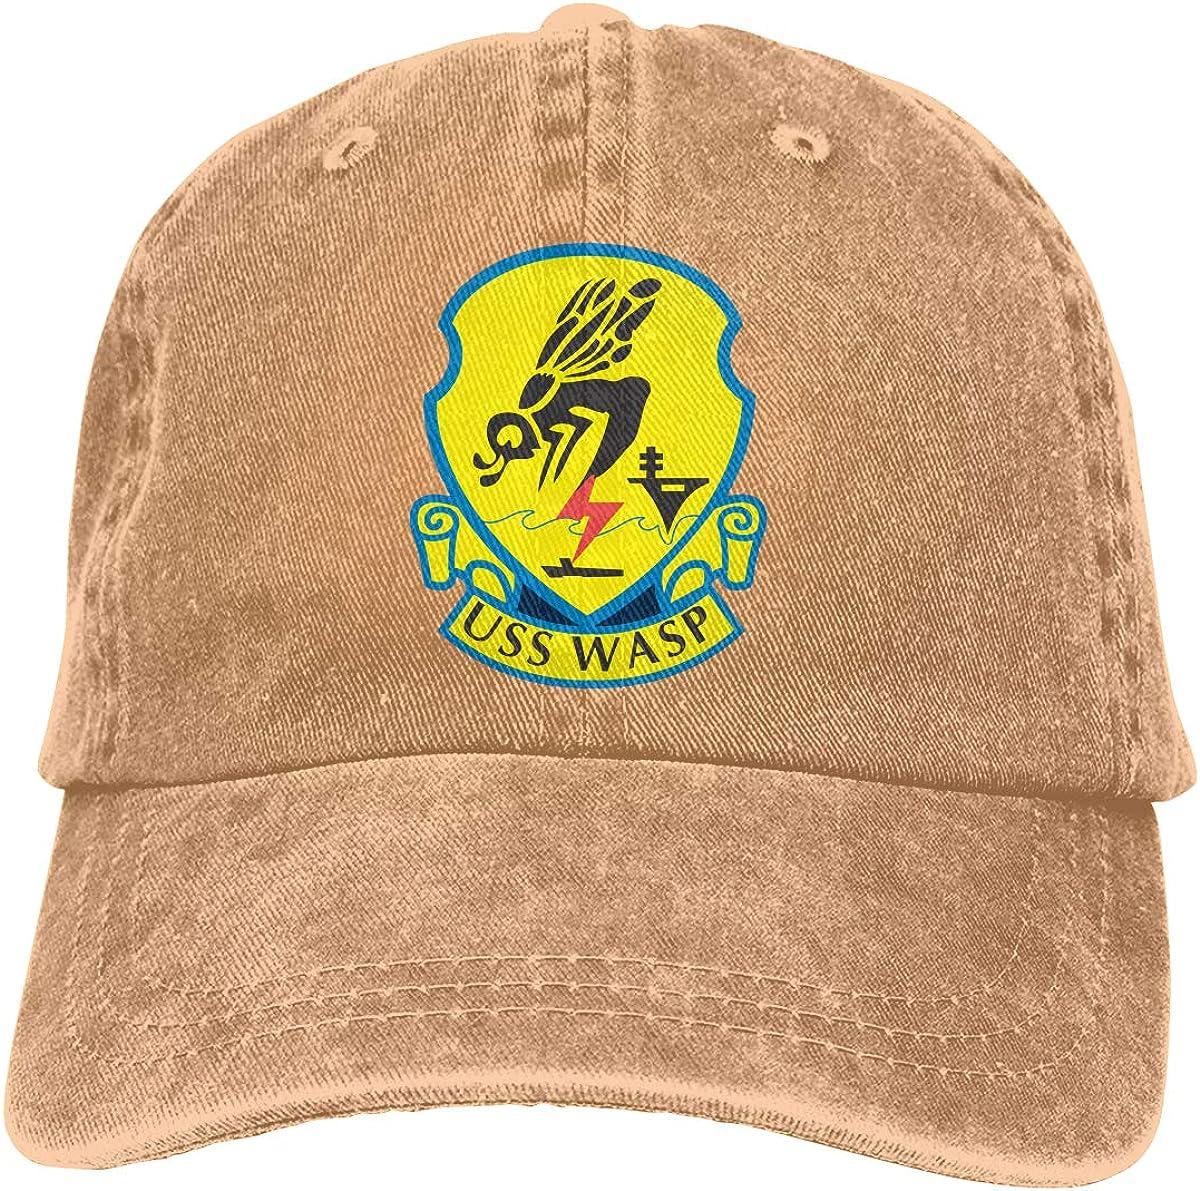 SLISL EIEI Navy USS Wasp LHD-1 Adjustable Baseball Caps Denim Hats Cowboy Sport Outdoor